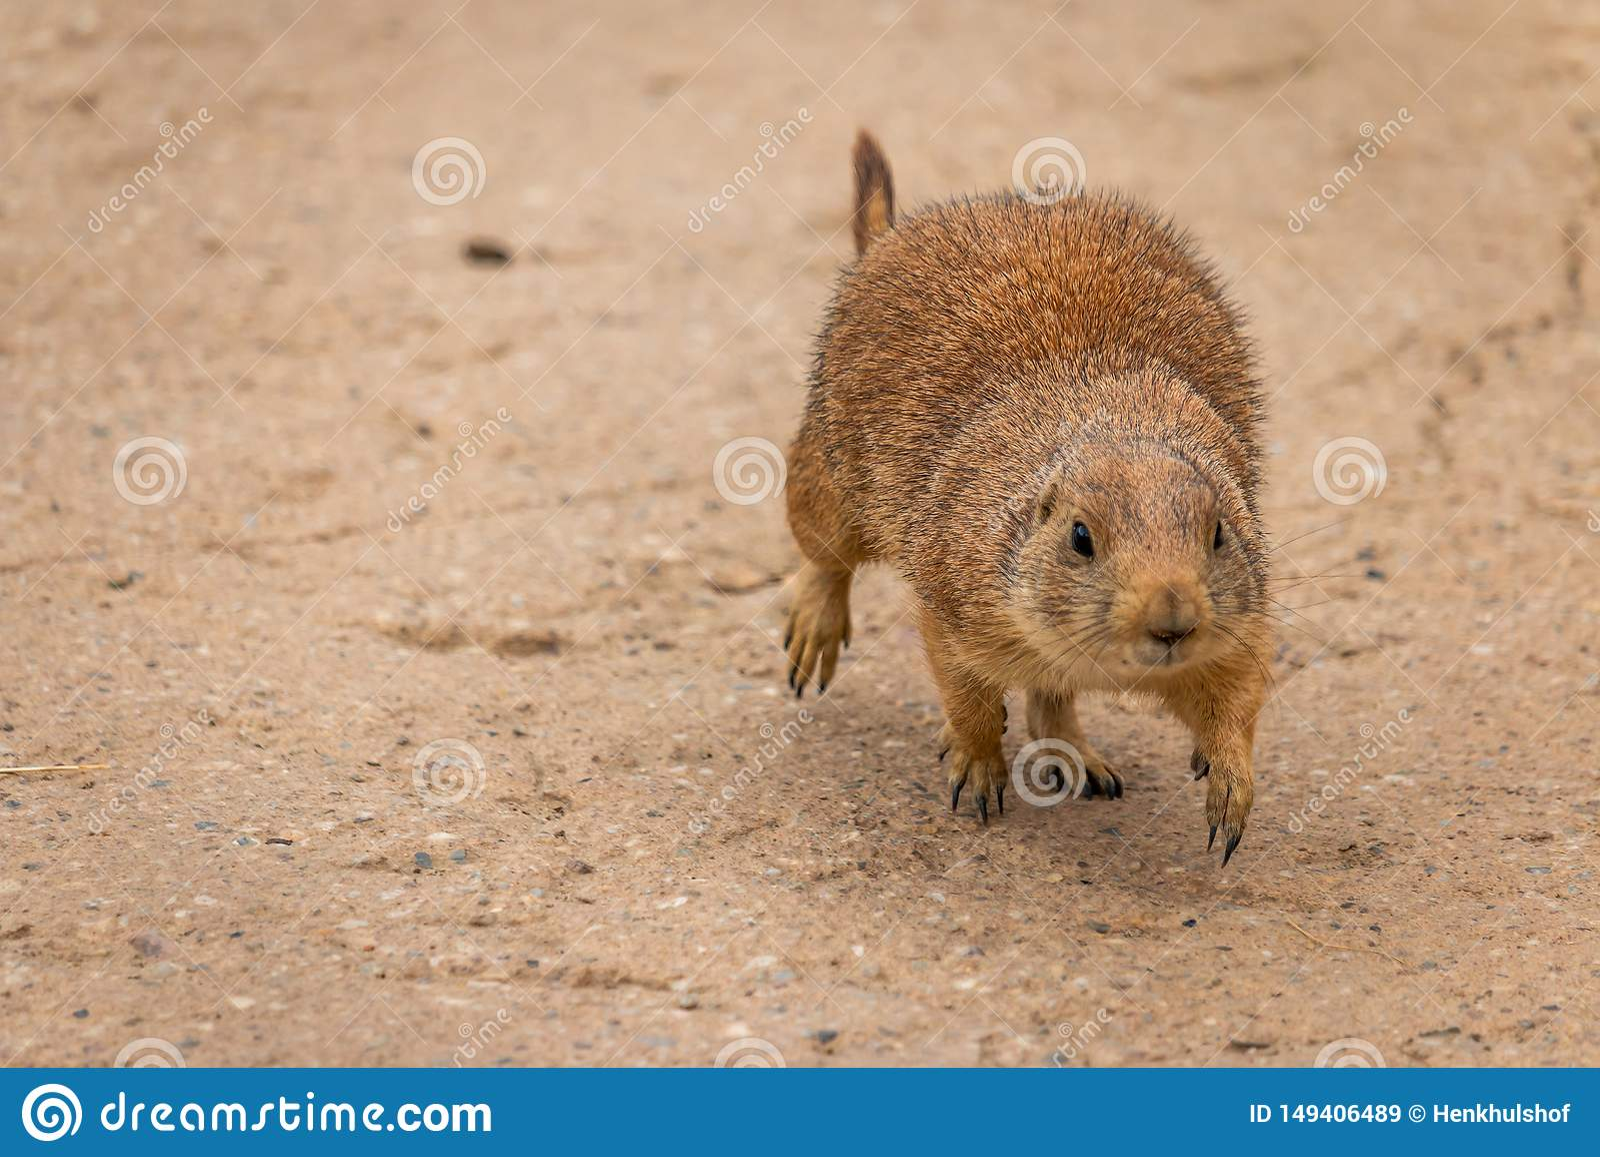 A beautiful prairie dog Cynomys ludovicianus